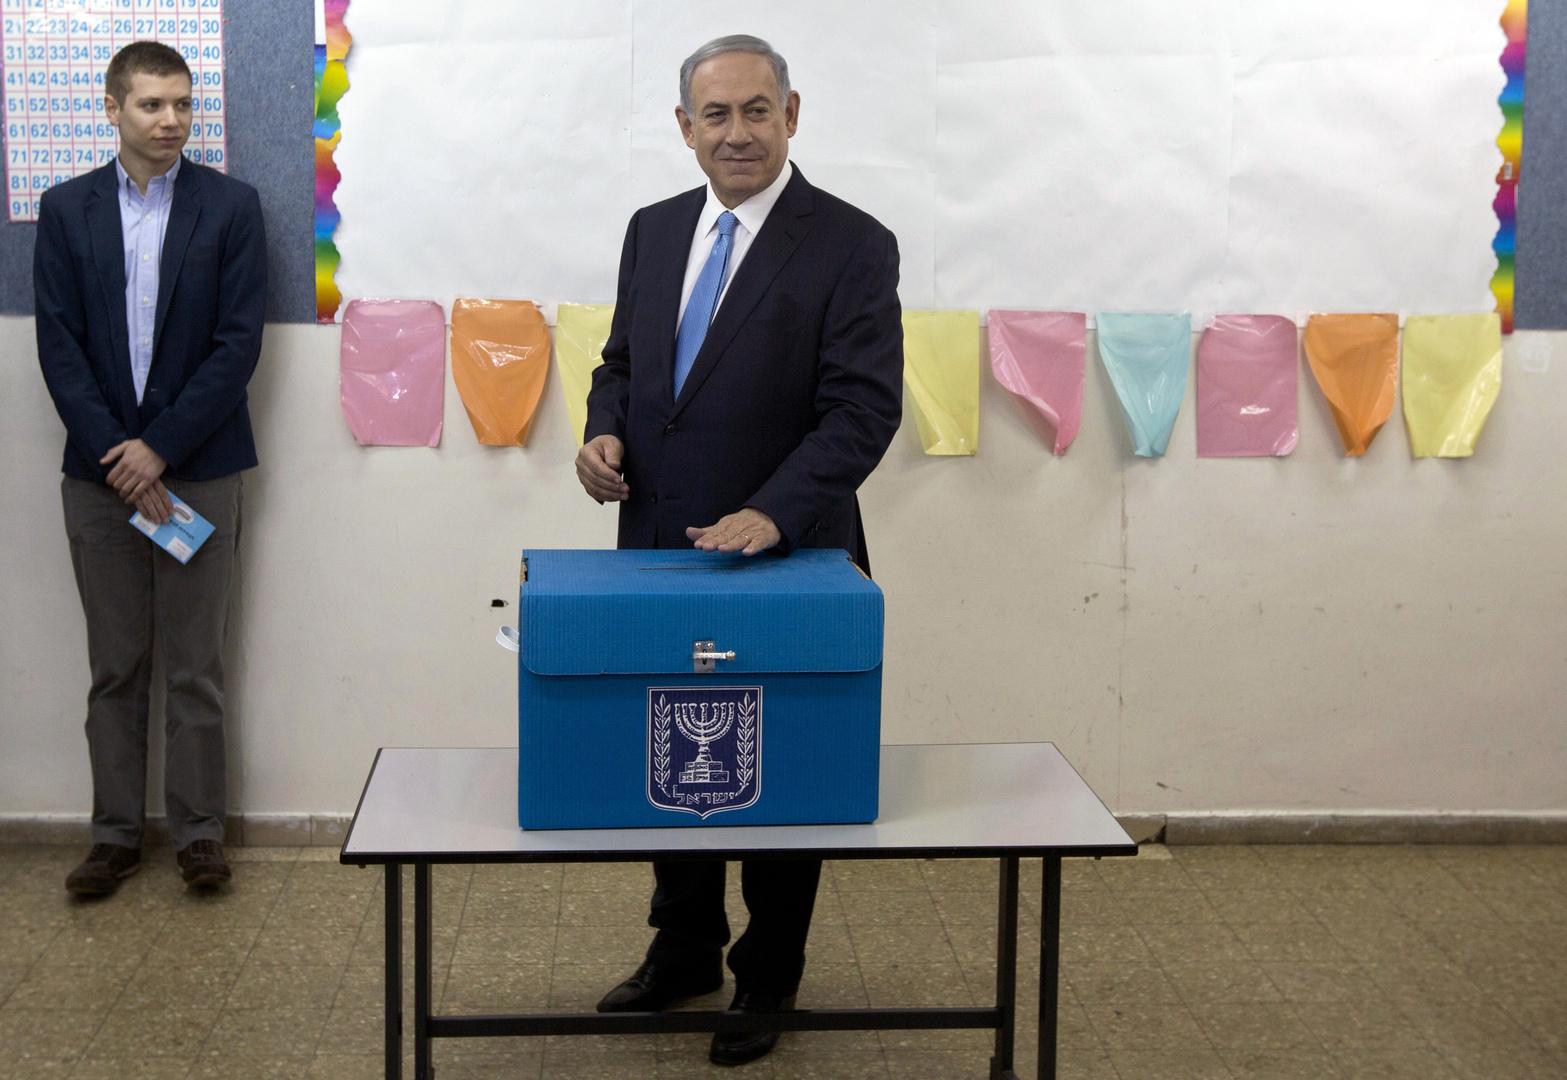 إسرائيل.. حكم قضائي ضد نجل نتنياهو لصالح صحفية